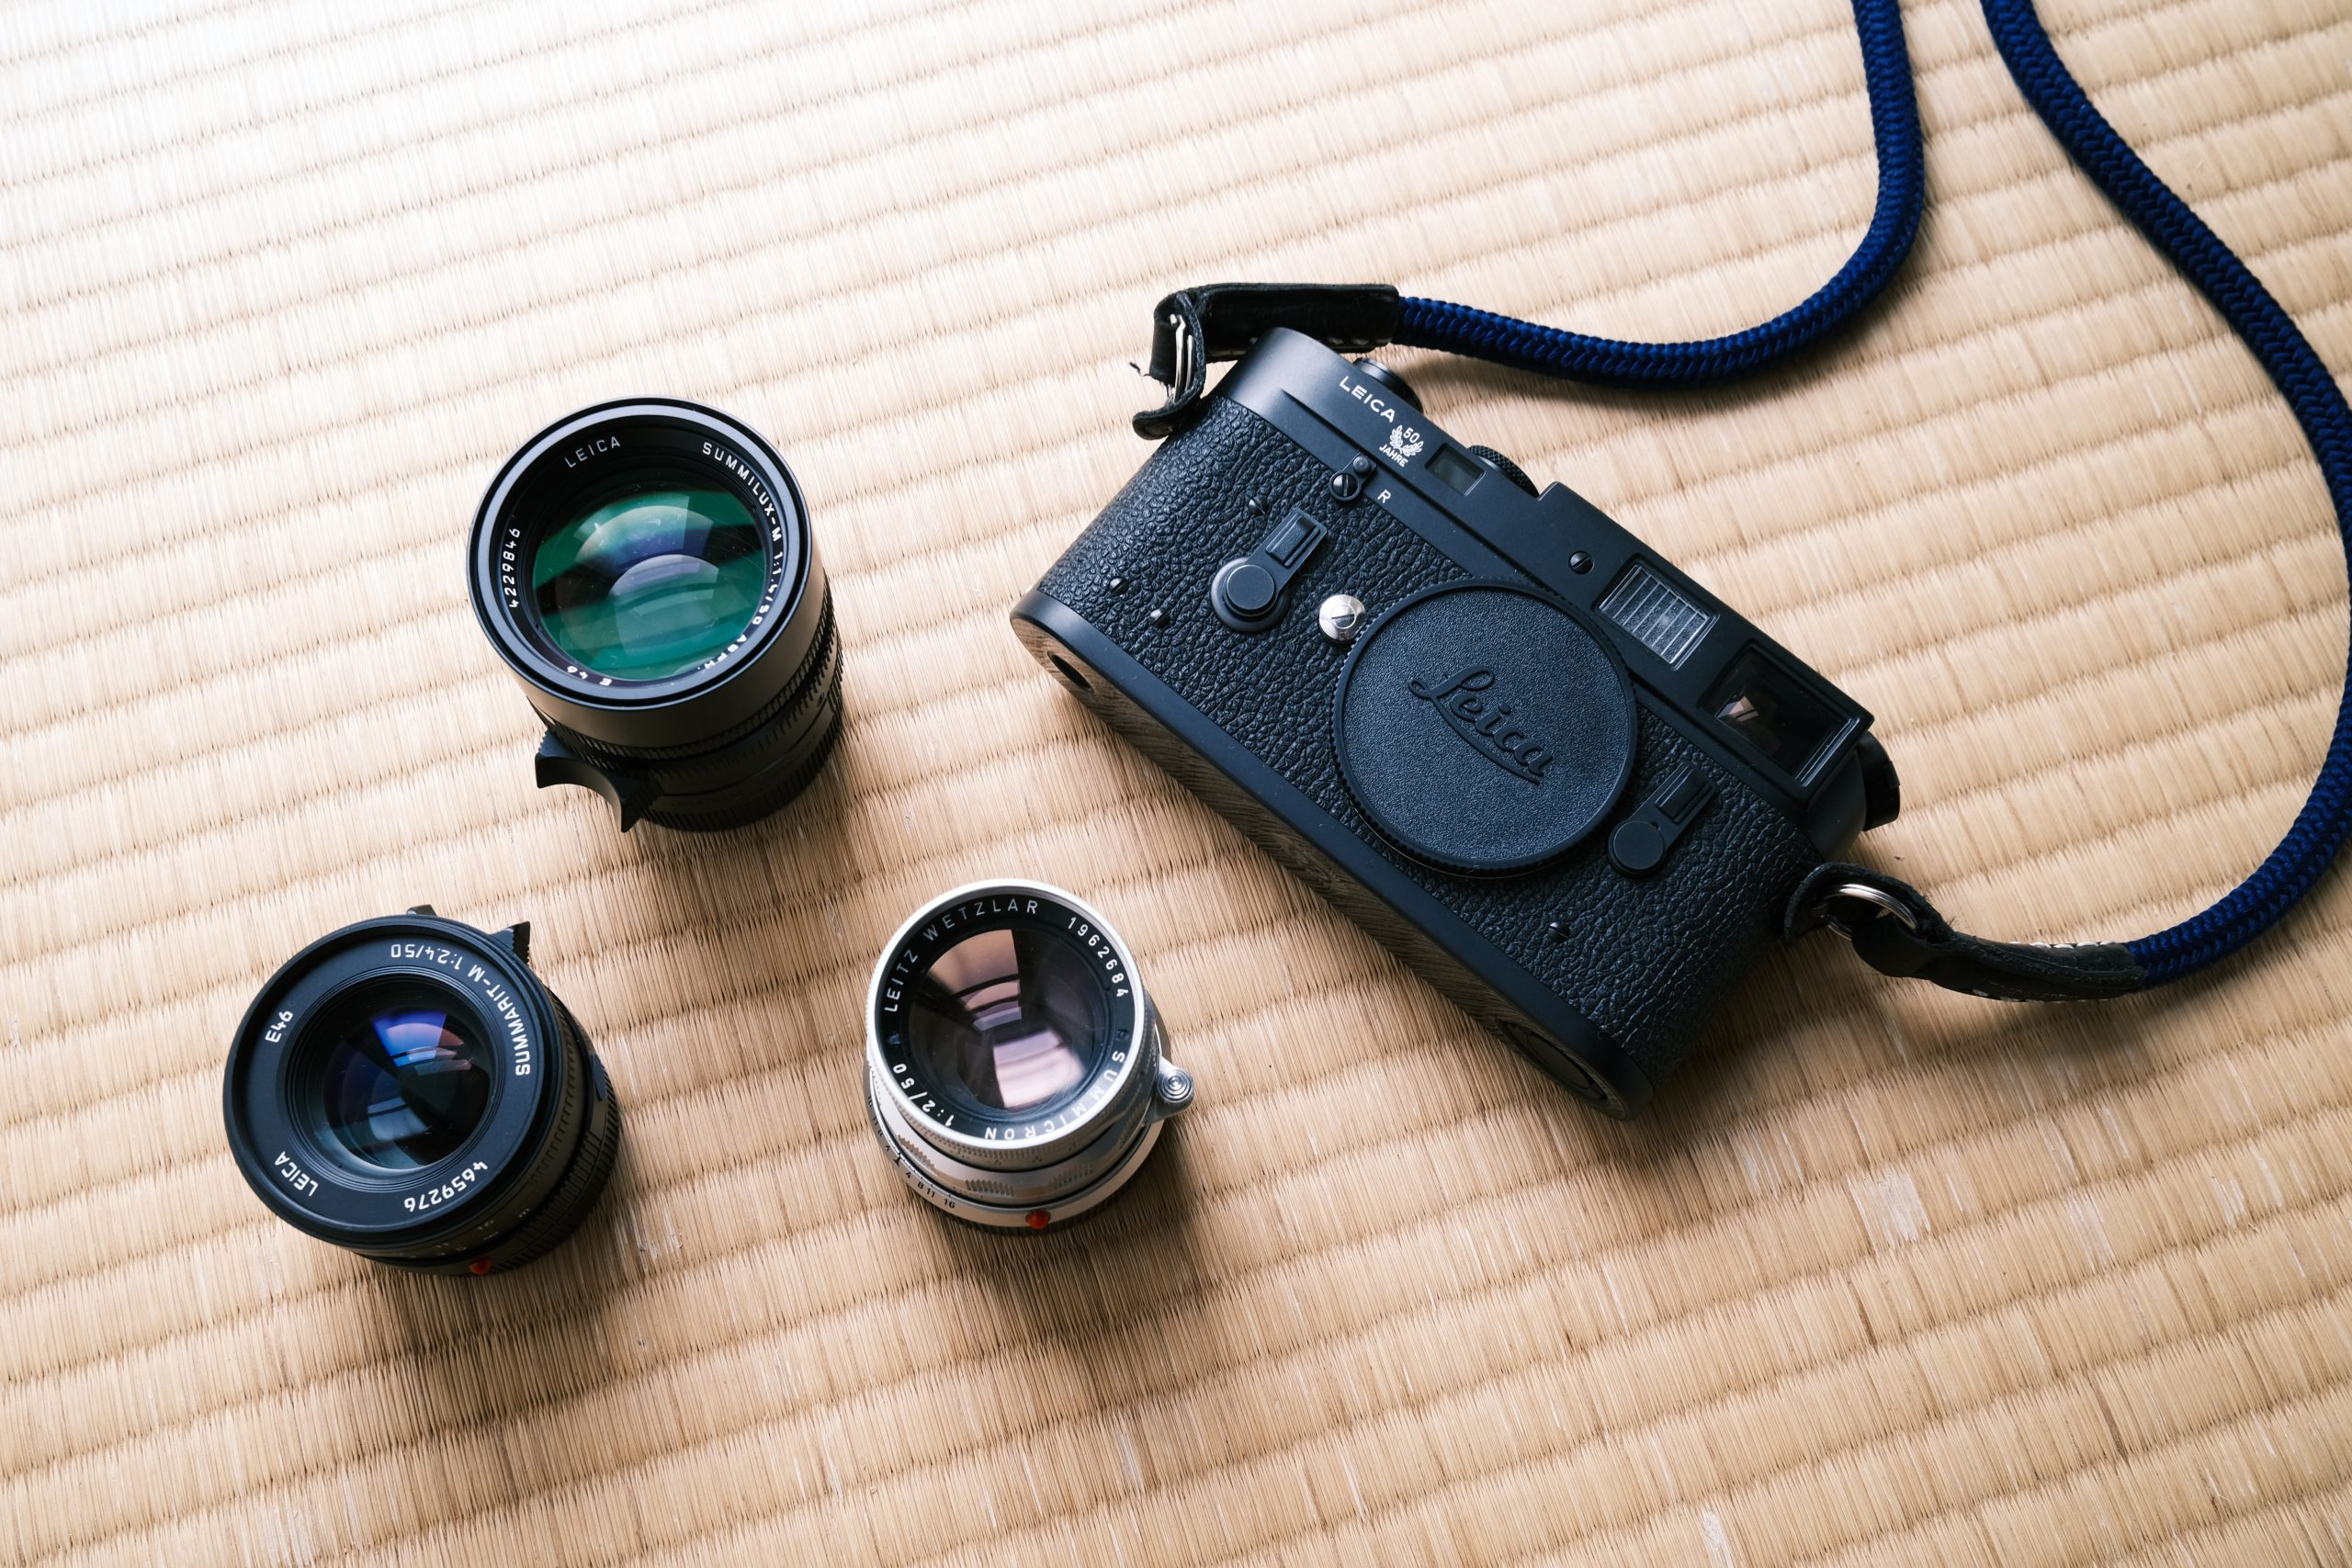 Leica M4で撮影した写真を振り返る。